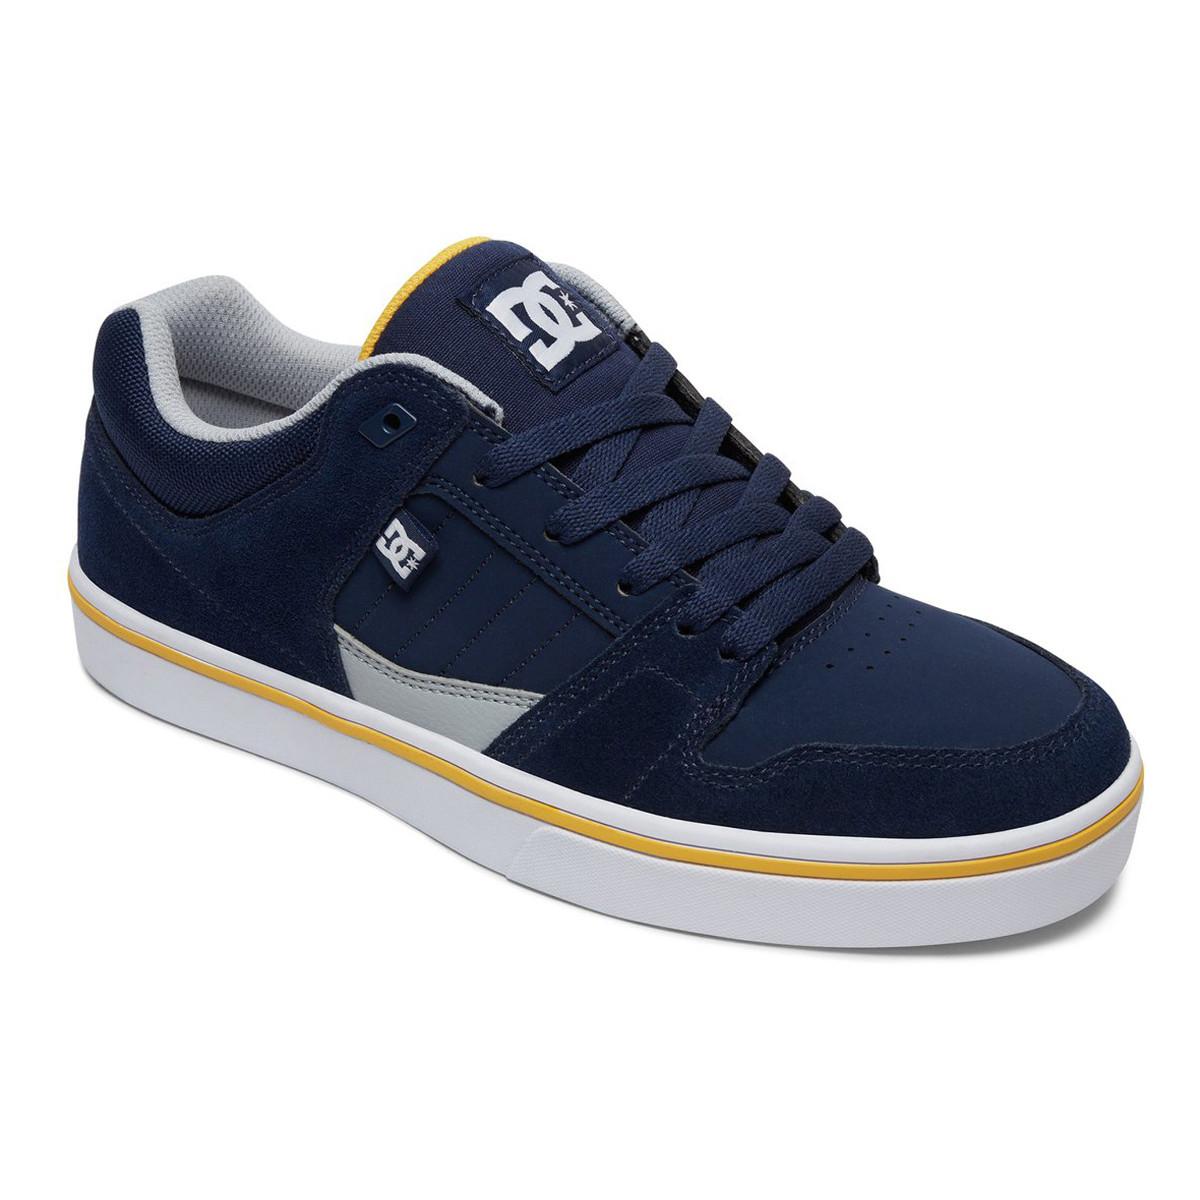 Course Dc Schuhe 2 gelb Navy 7TZB8S